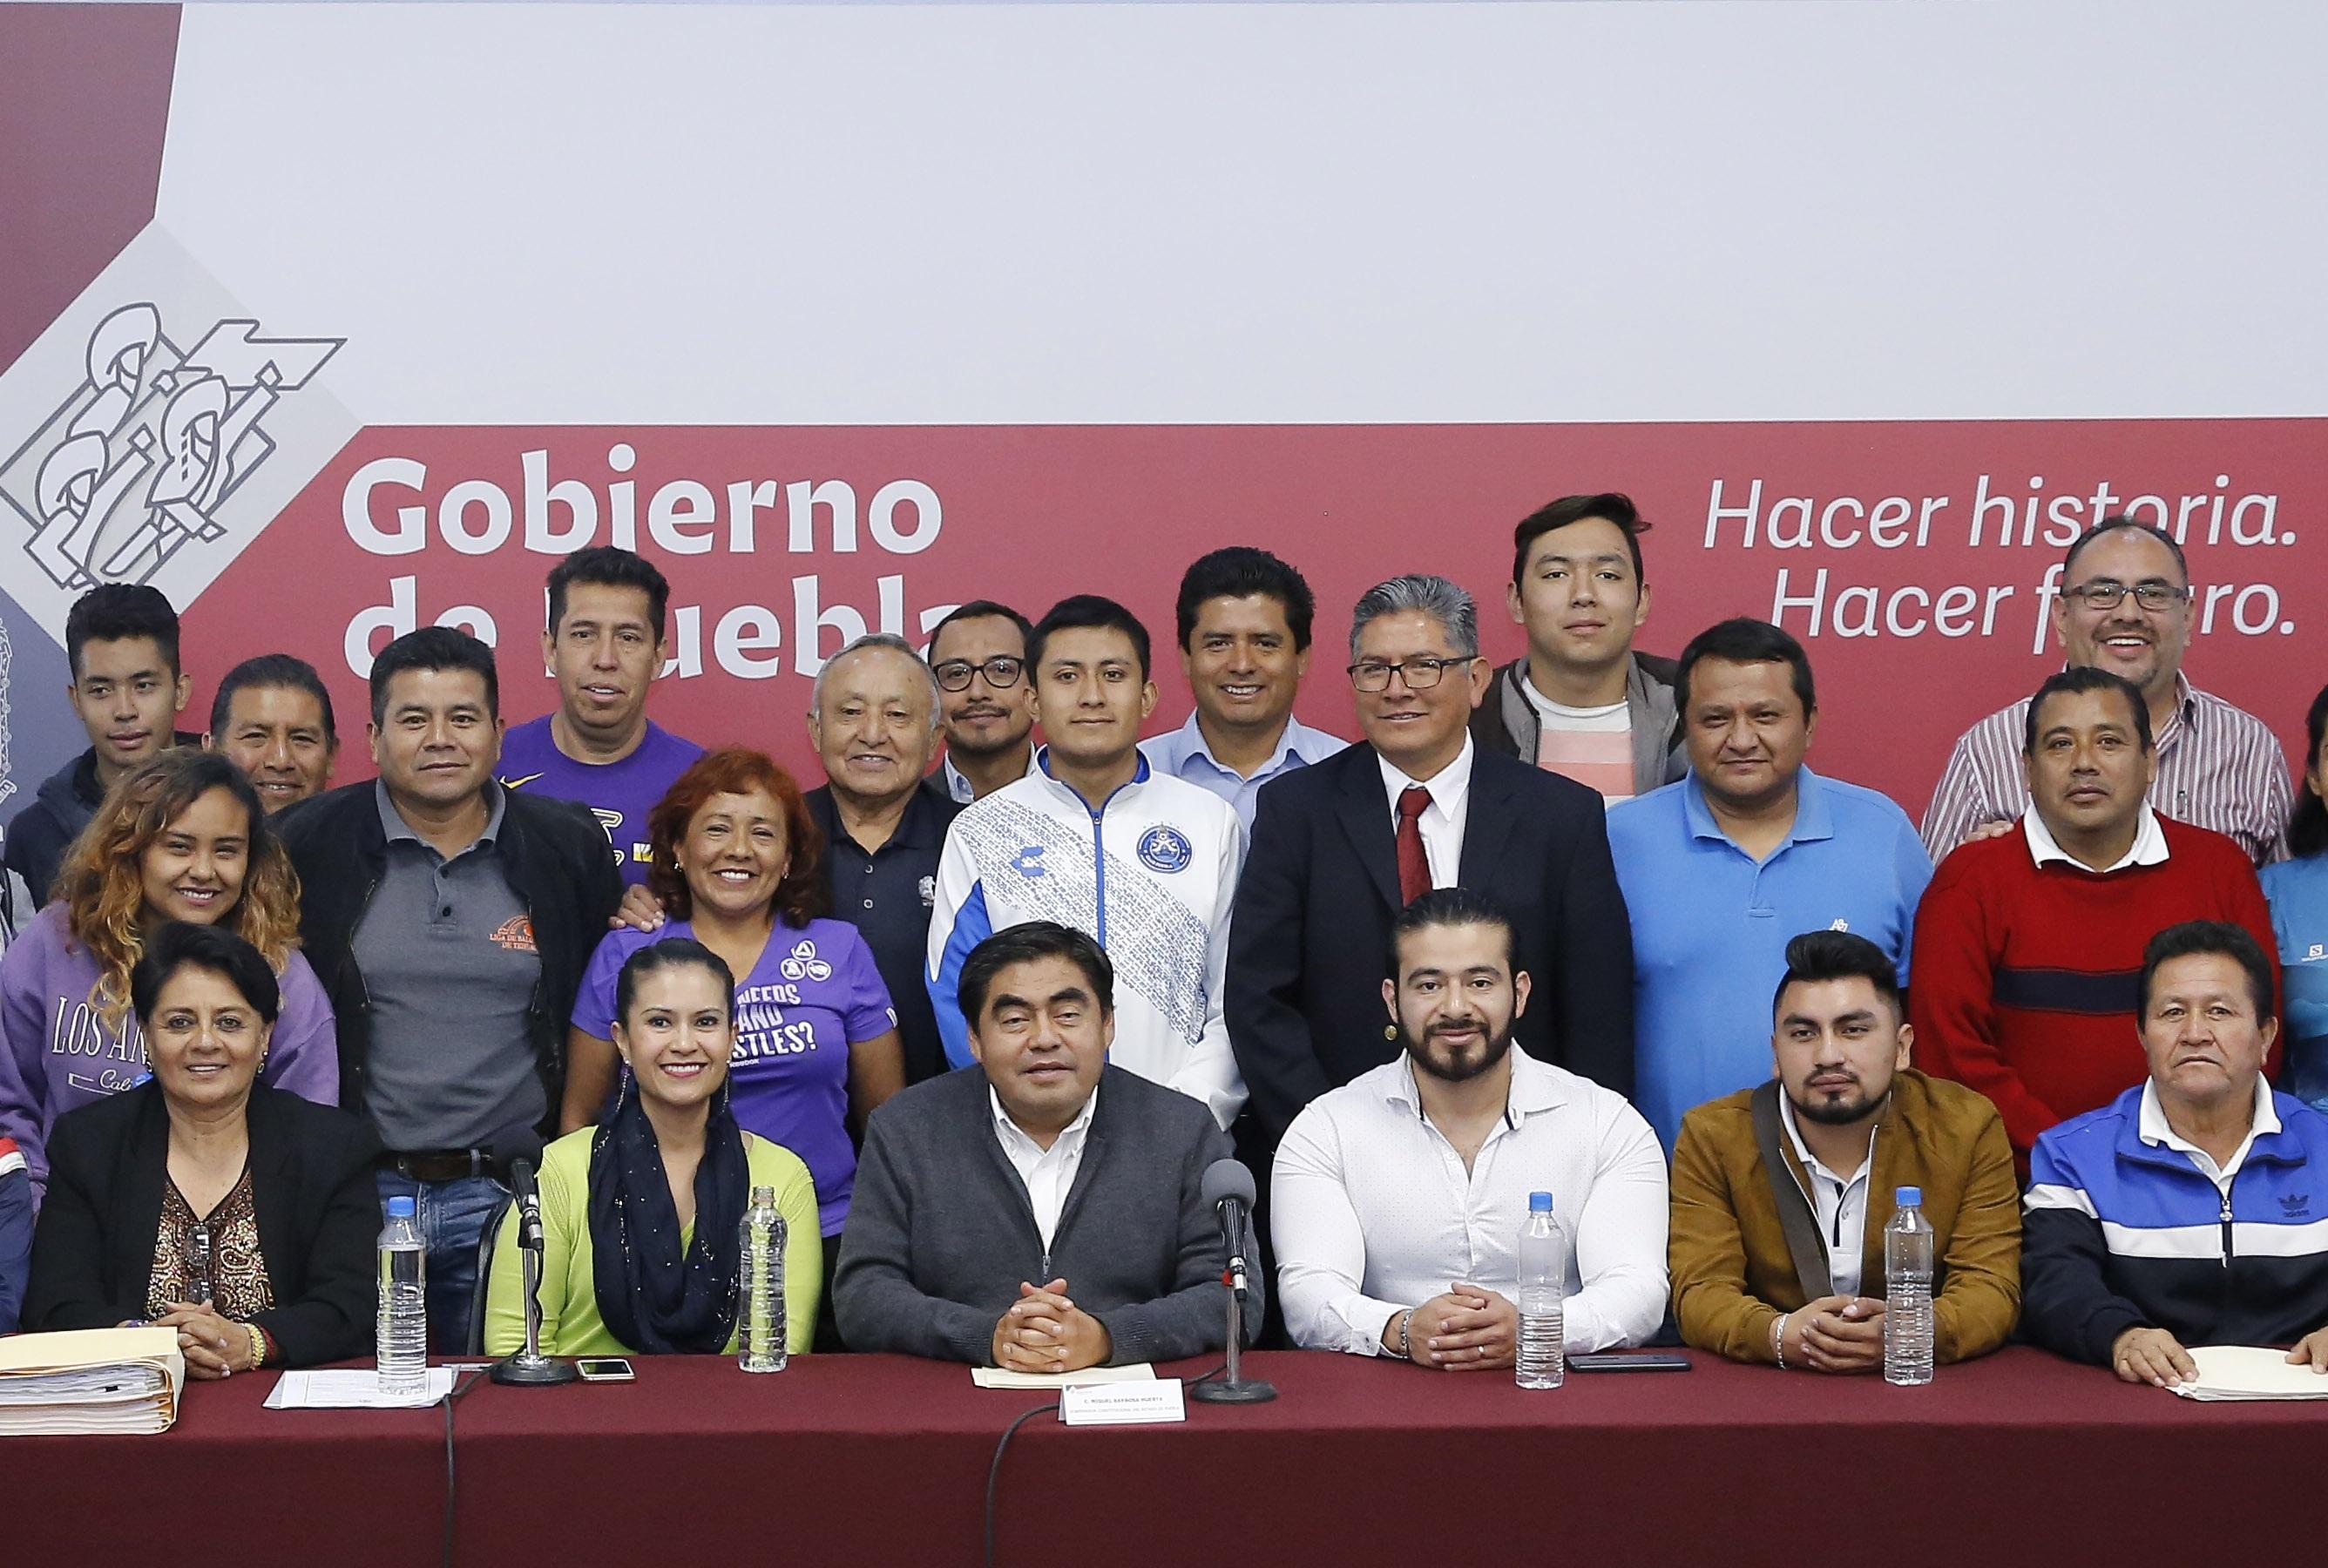 Ofrece Barbosa rehabilitar espacios deportivos en Tehuacán